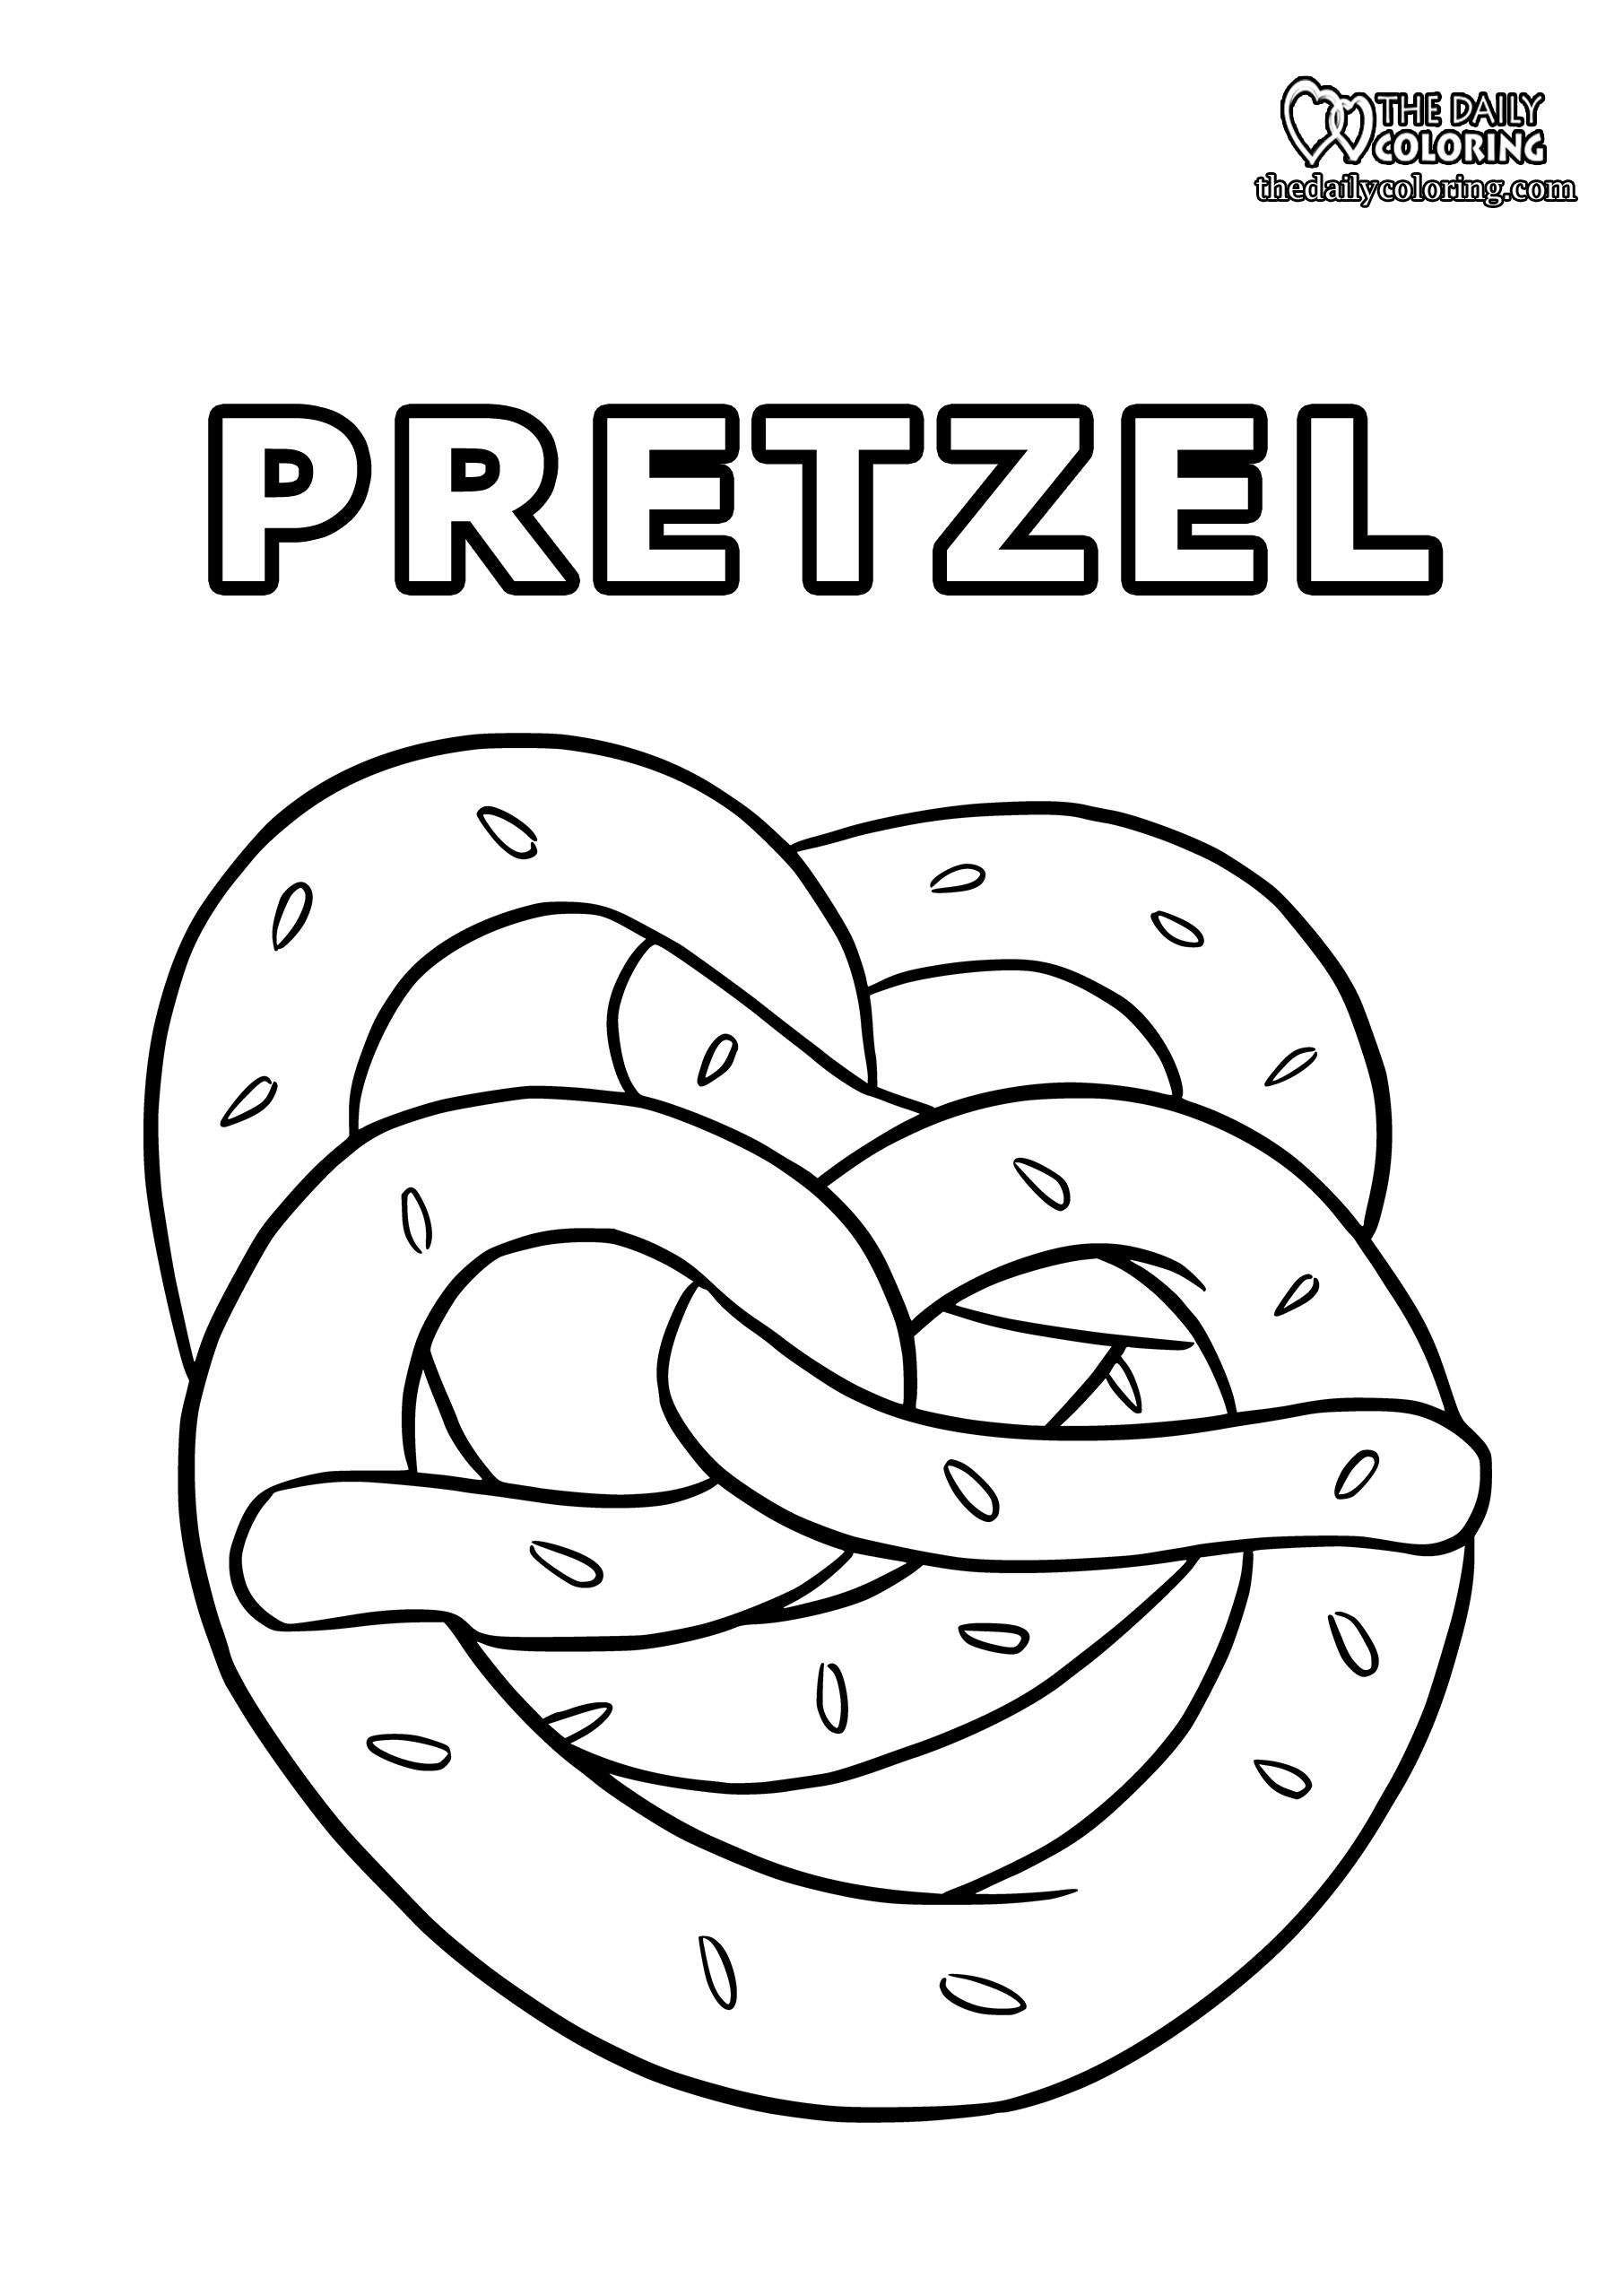 pretzel-coloring-page